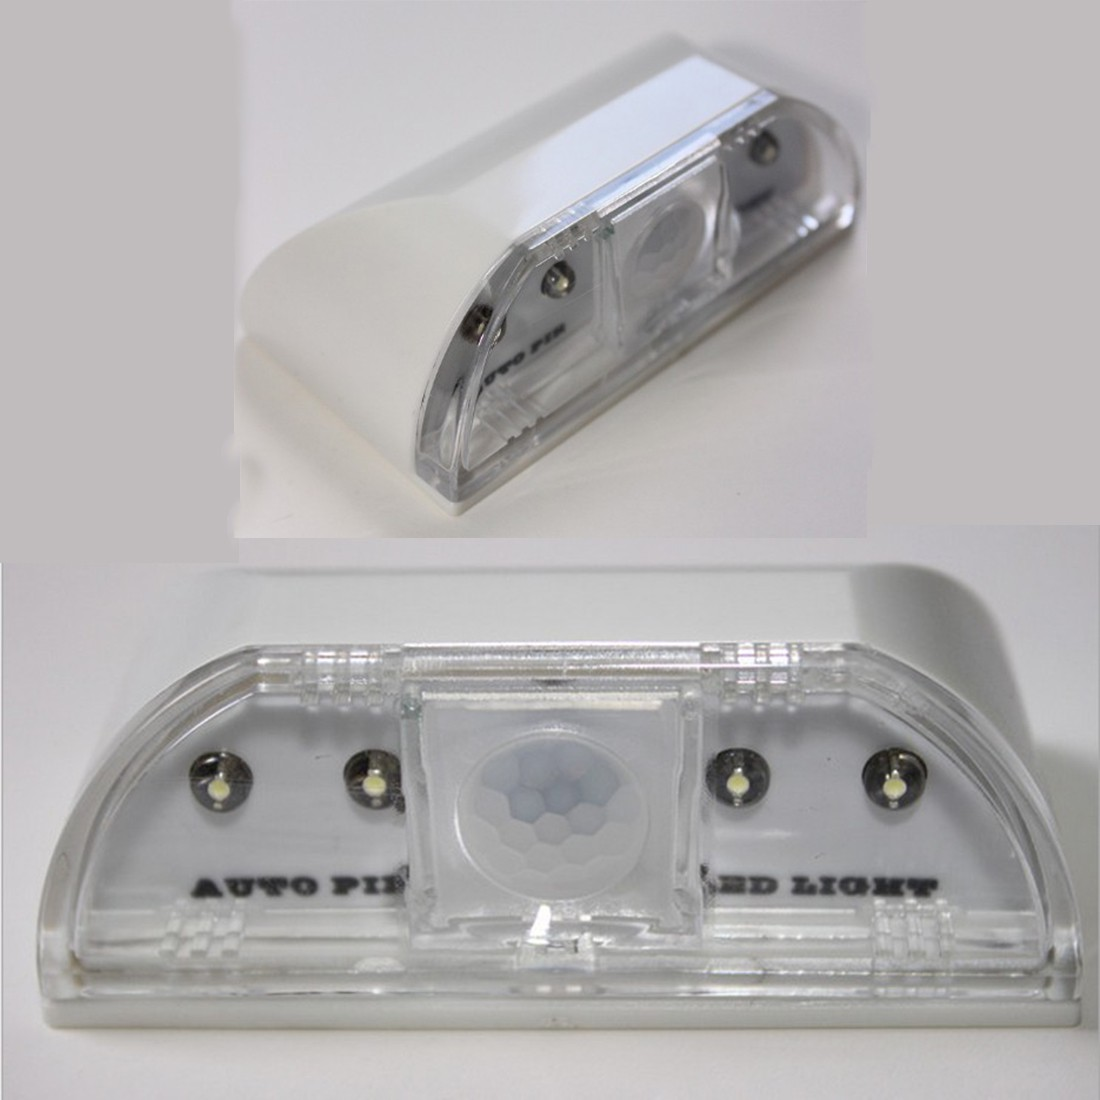 Lamp Night Light Intelligent Auto PIR Door Lock Induction Lamp Door Keyhole IR Motion Sensor Heat Detector 4 LED Smart Light